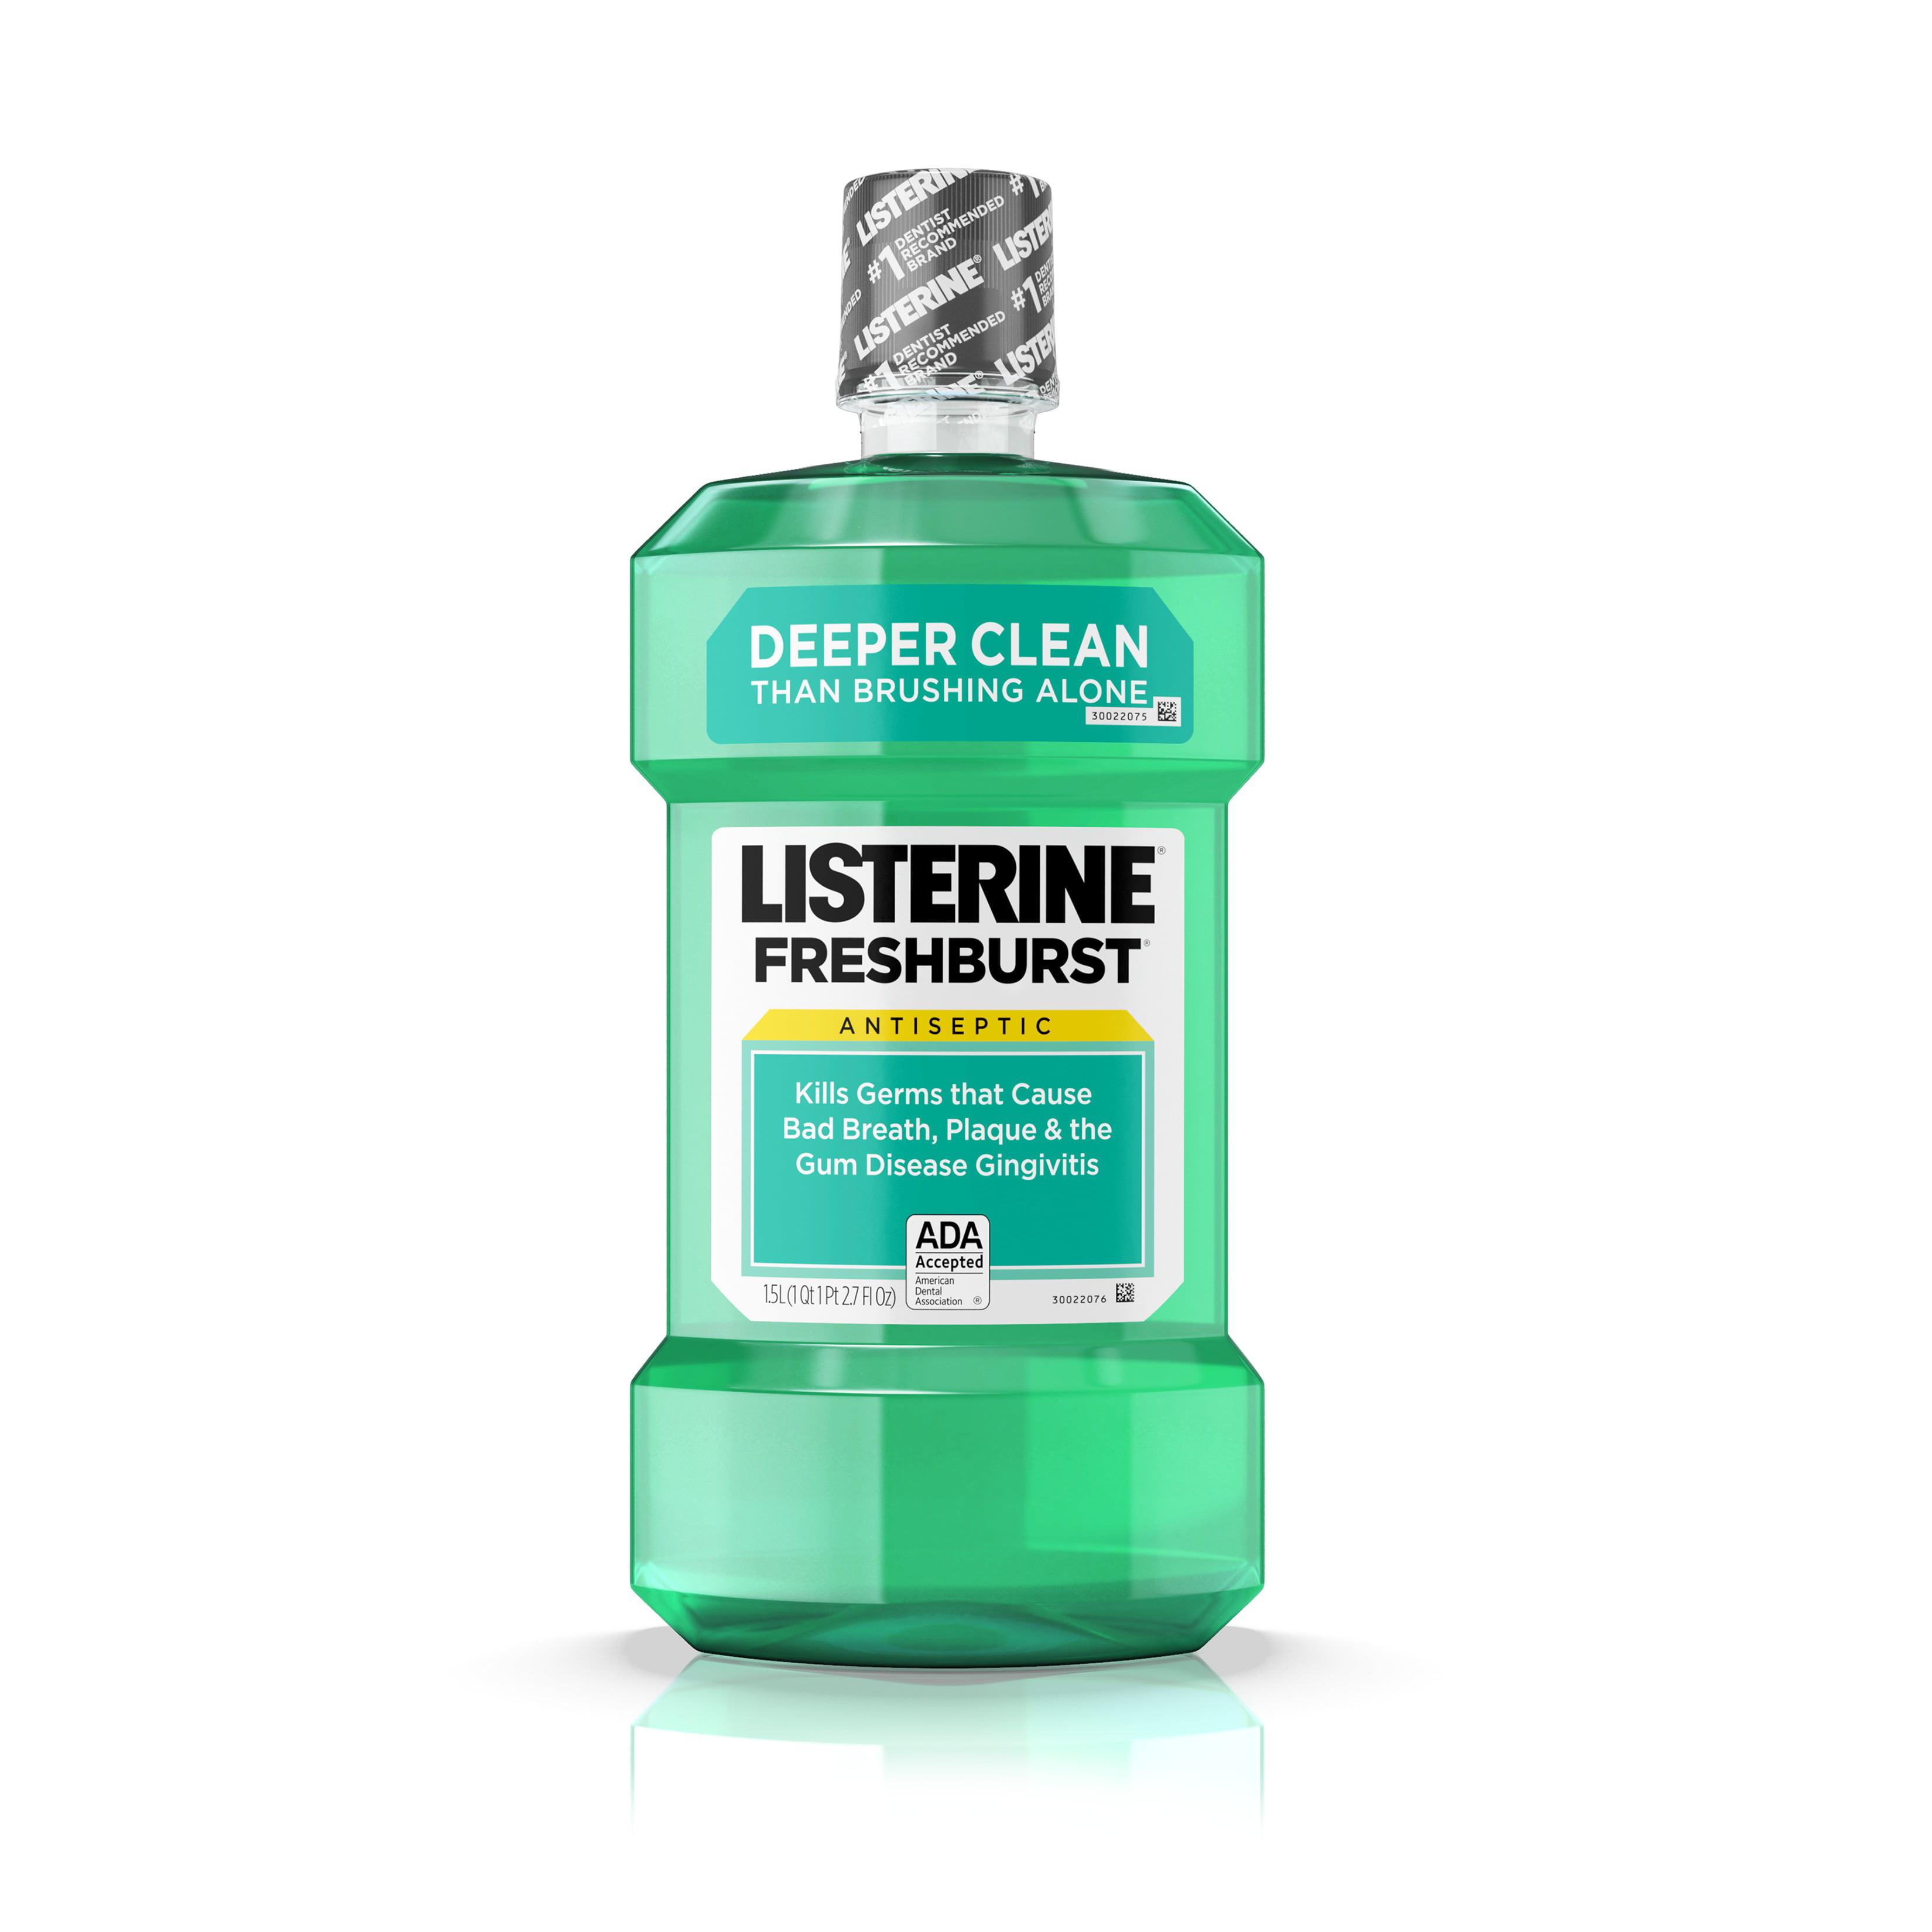 Listerine Freshburst Antiseptic Mouthwash for Bad Breath, 1.5 L